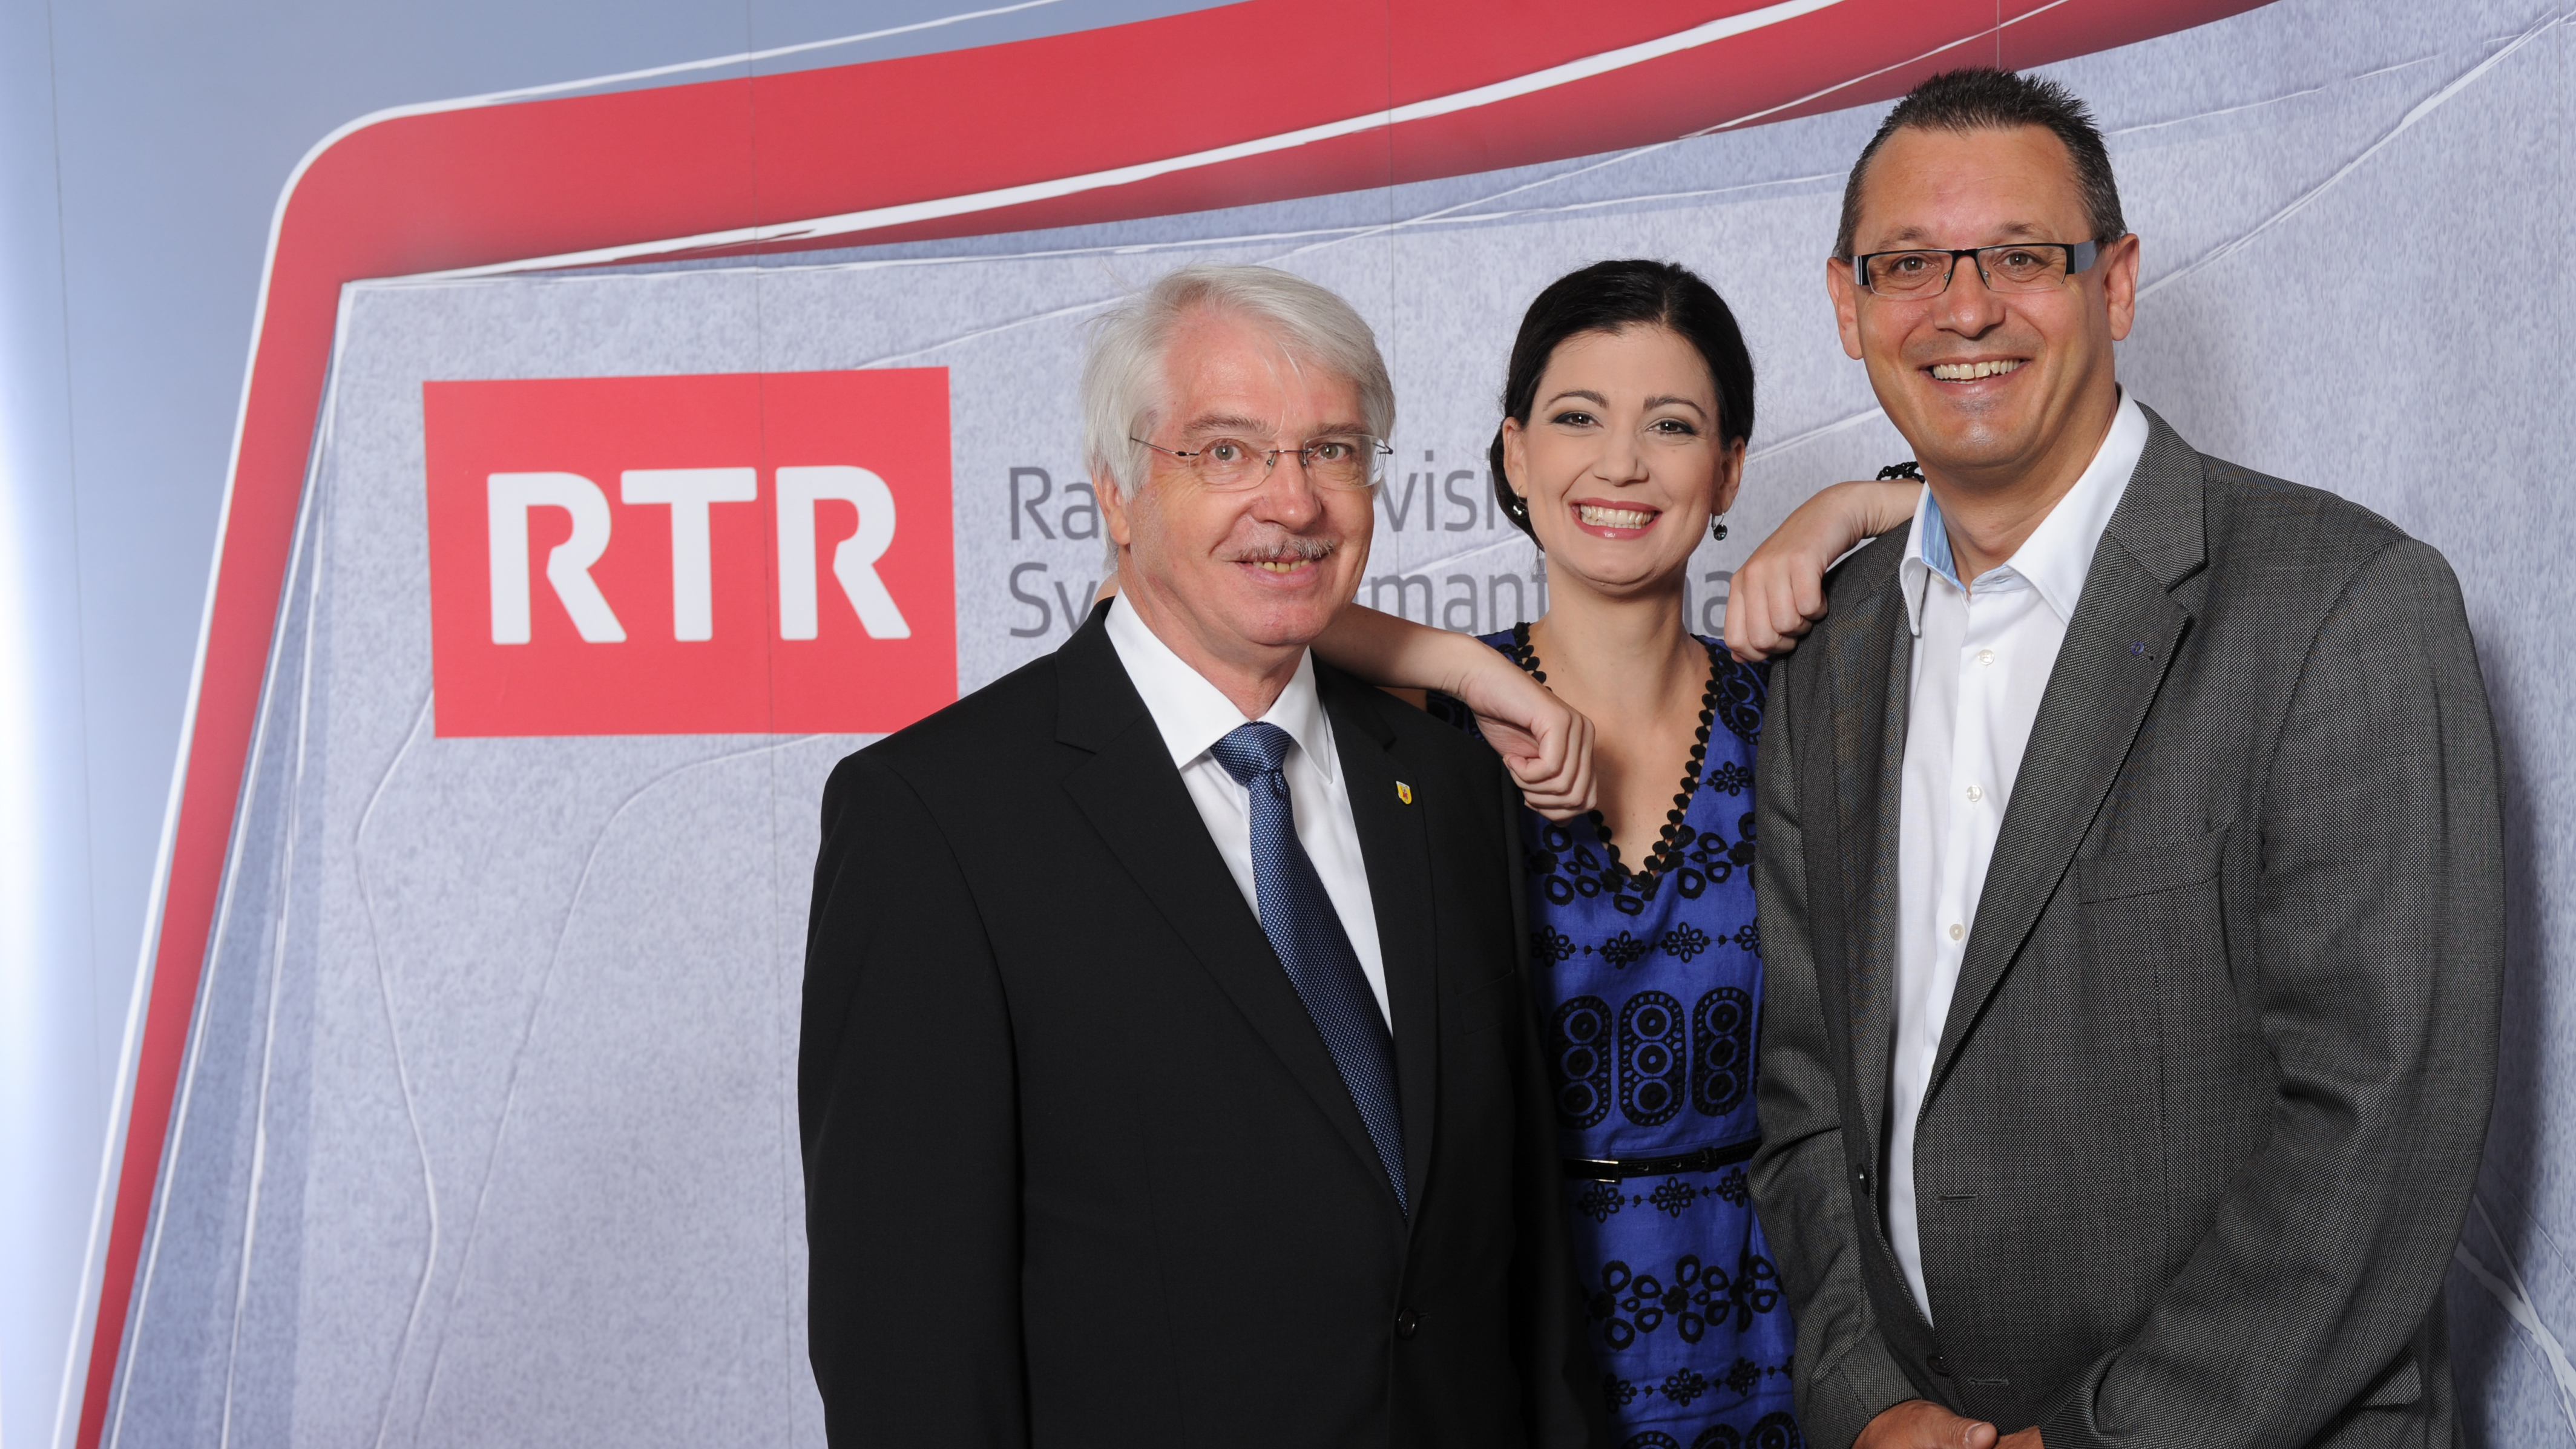 Theo Haas, Maria Victoria Haas e Maurus Dosch.